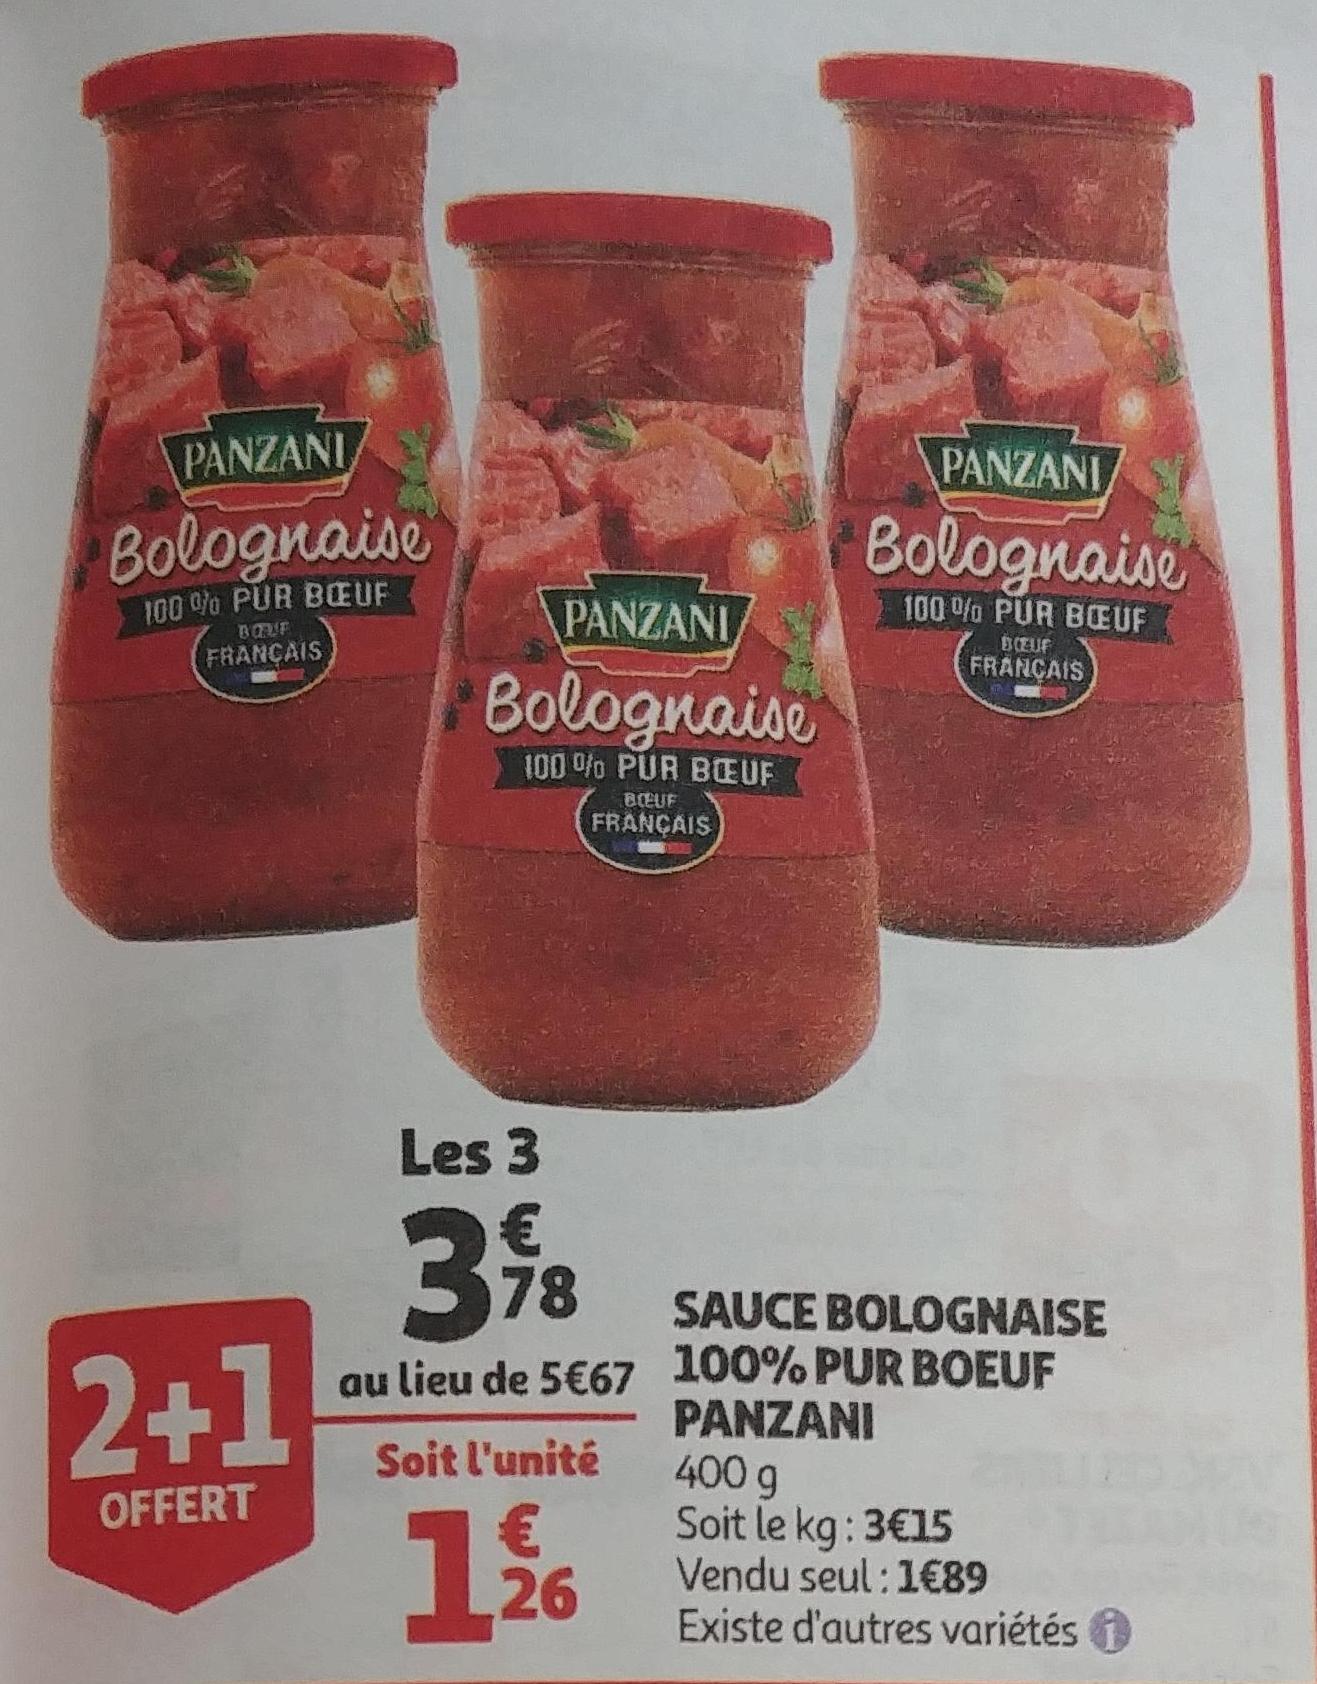 3 Pots de sauce bolognaise Panzani Pur Boeuf - 400g (via Shopmium)